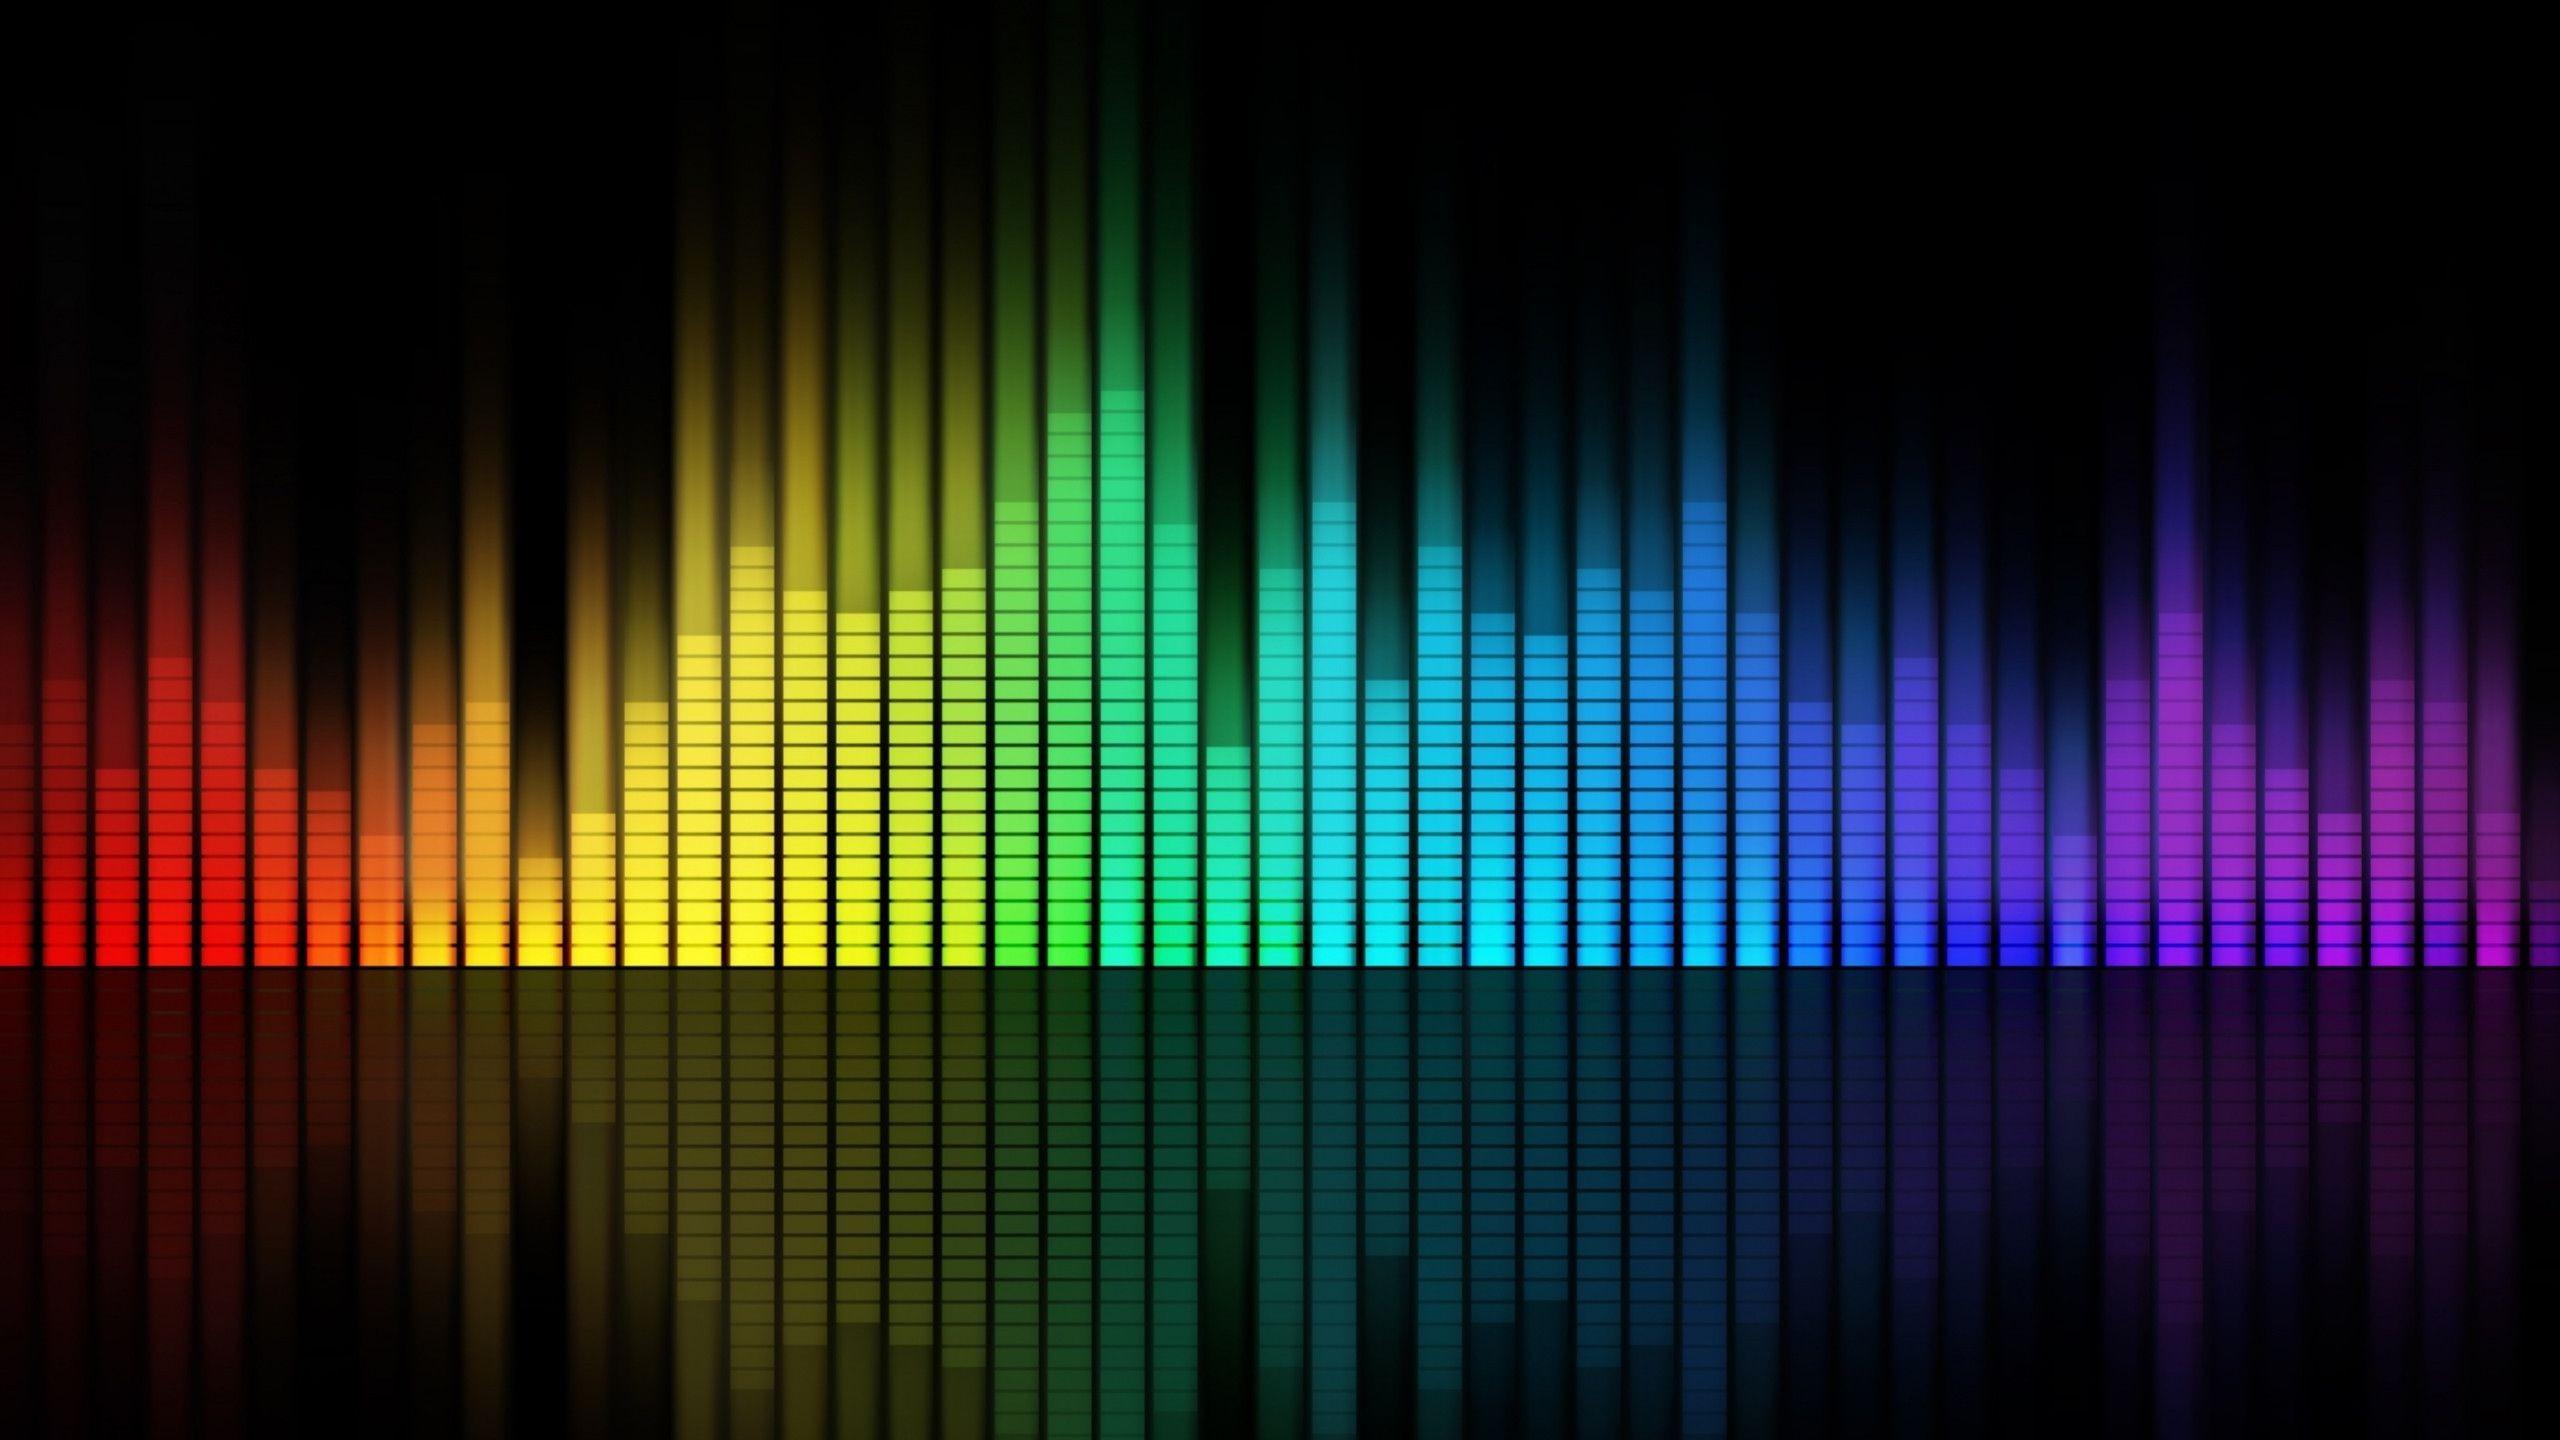 50 Music Wallpaper For Ipad On Wallpapersafari: 1440 Wallpaper ·① Download Free Amazing High Resolution